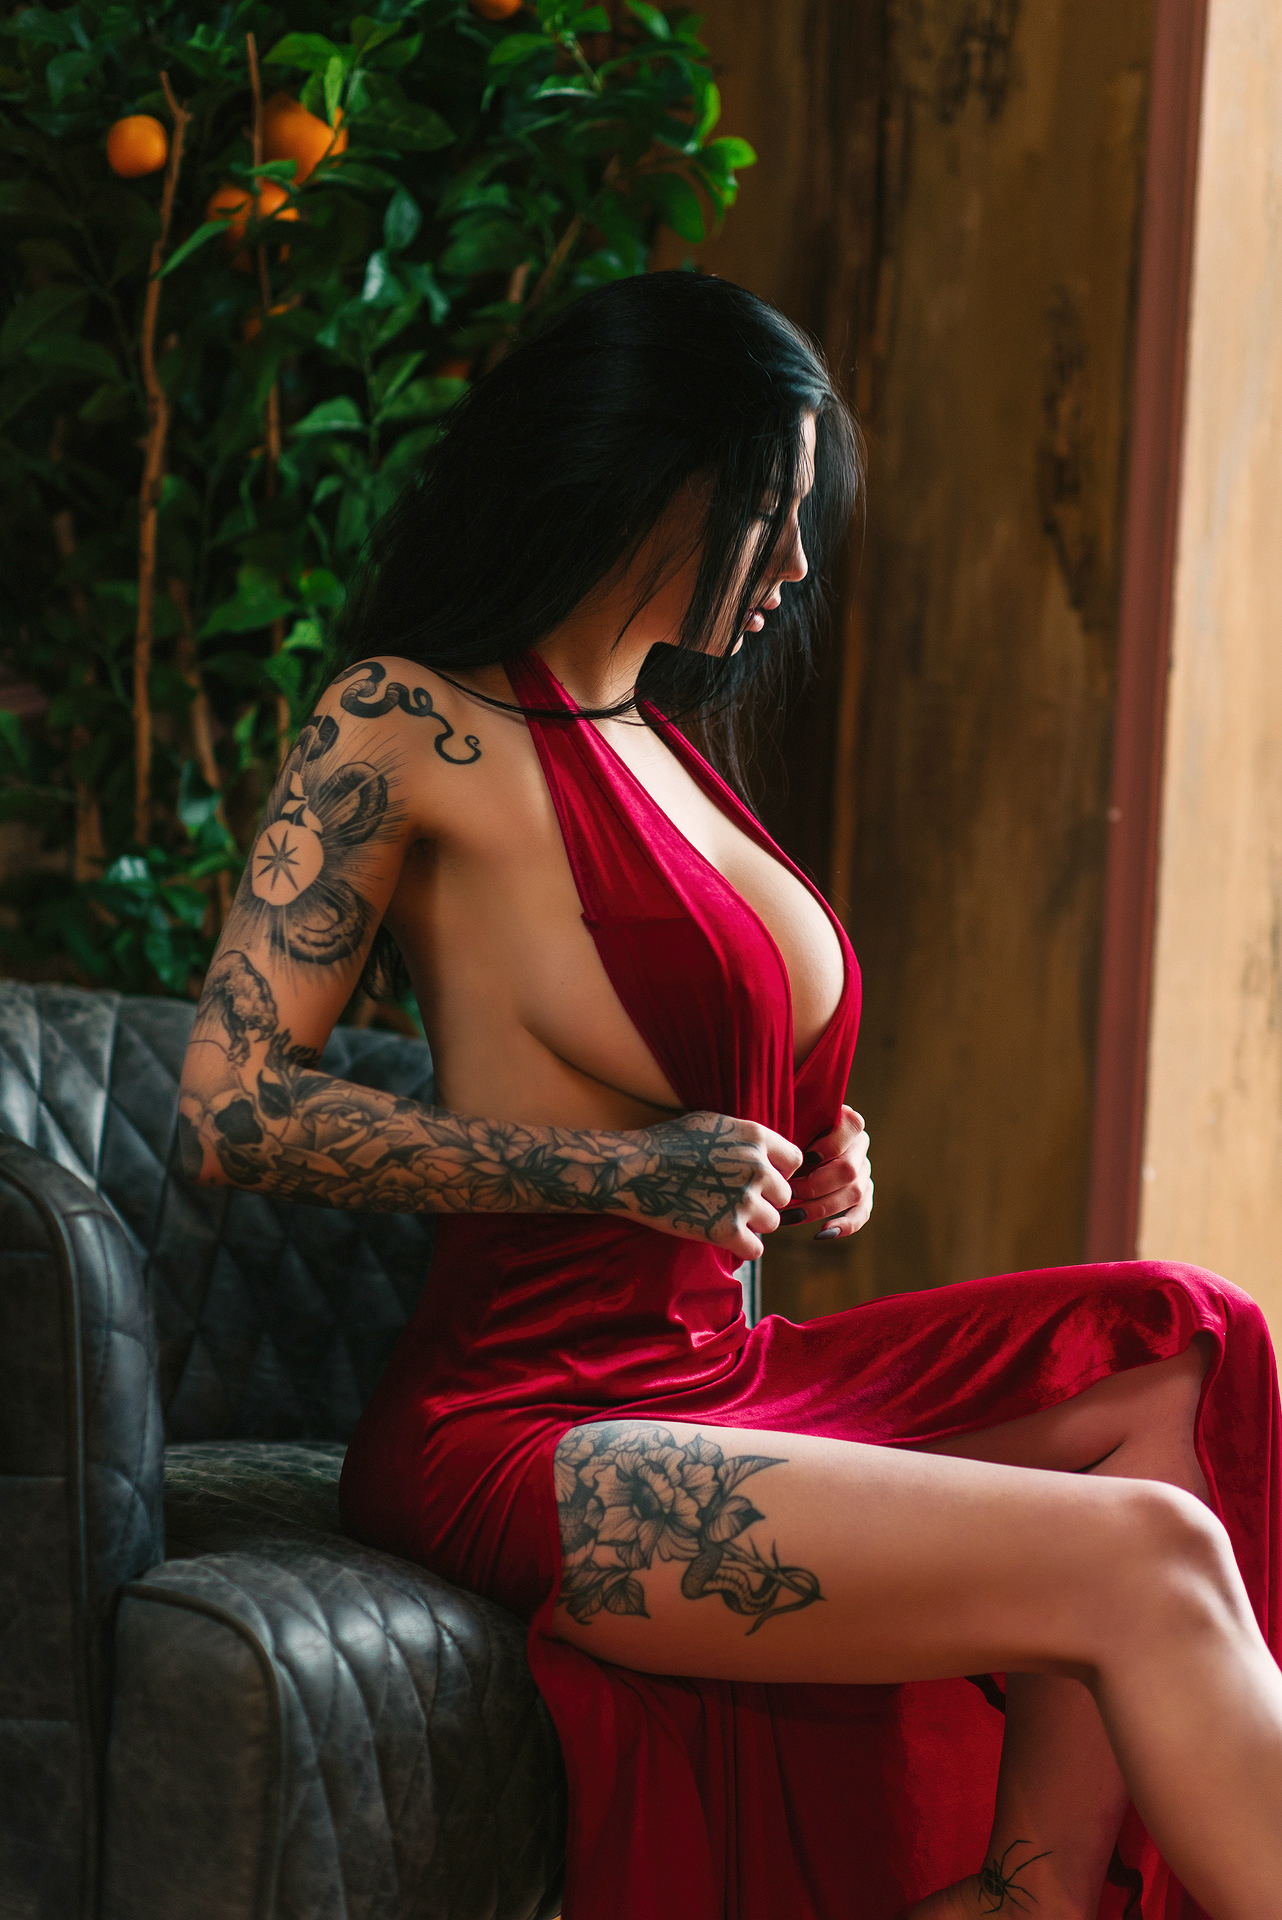 Red dress / фото Дмитрий Бугаенко модель Евгения Таланина